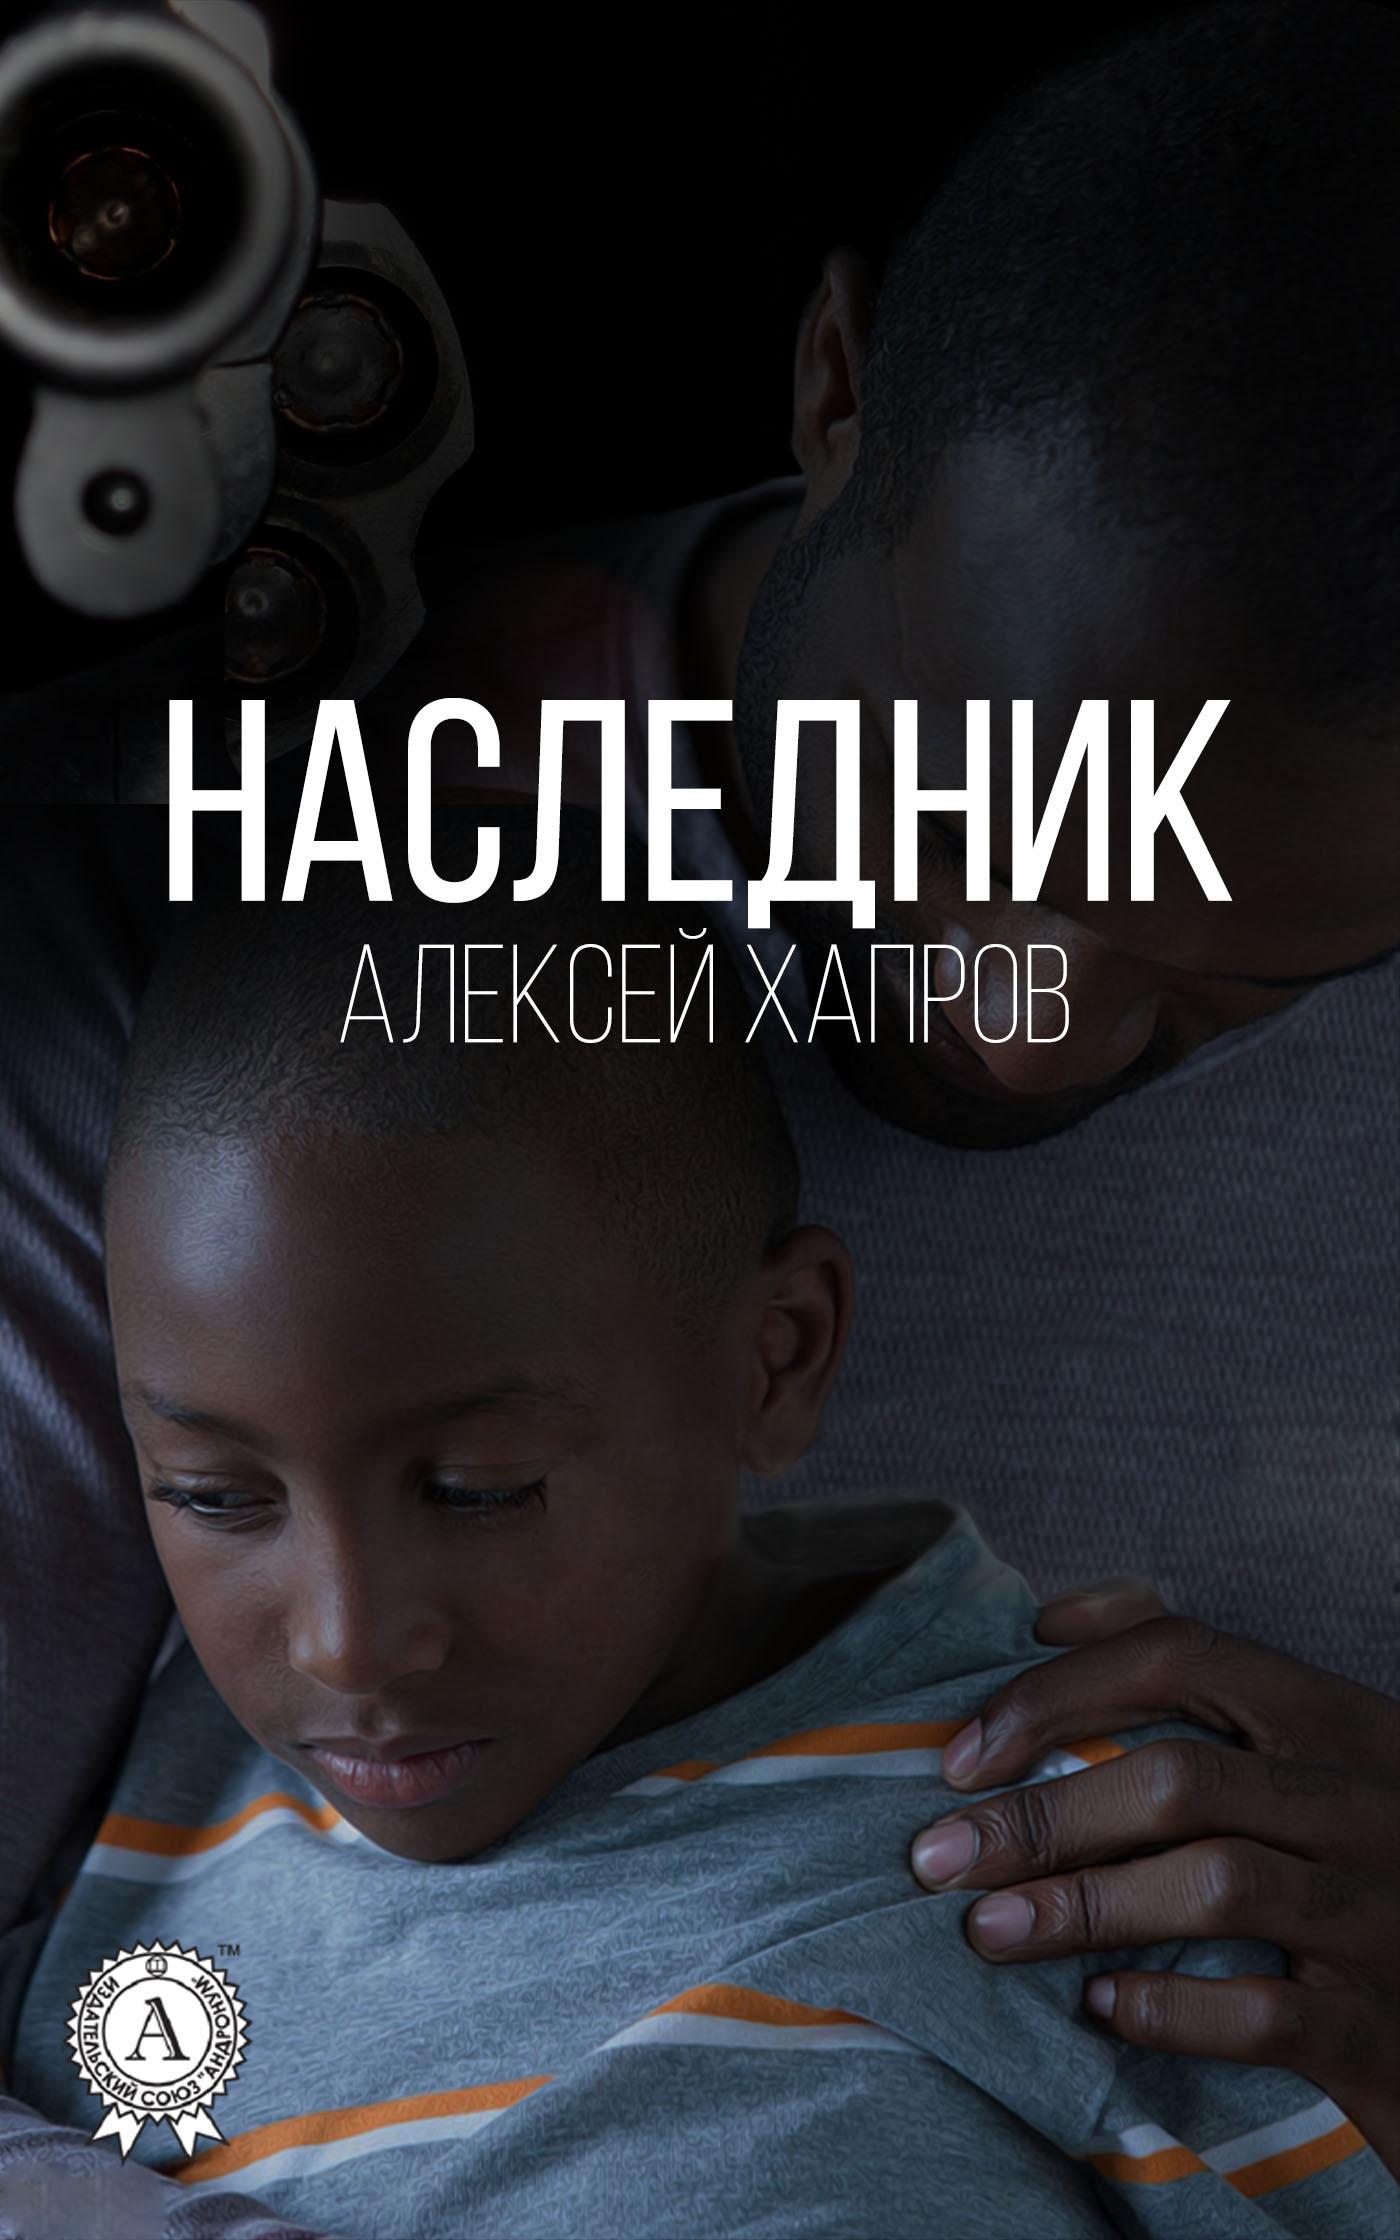 Алексей Викторович Хапров Наследник цена и фото